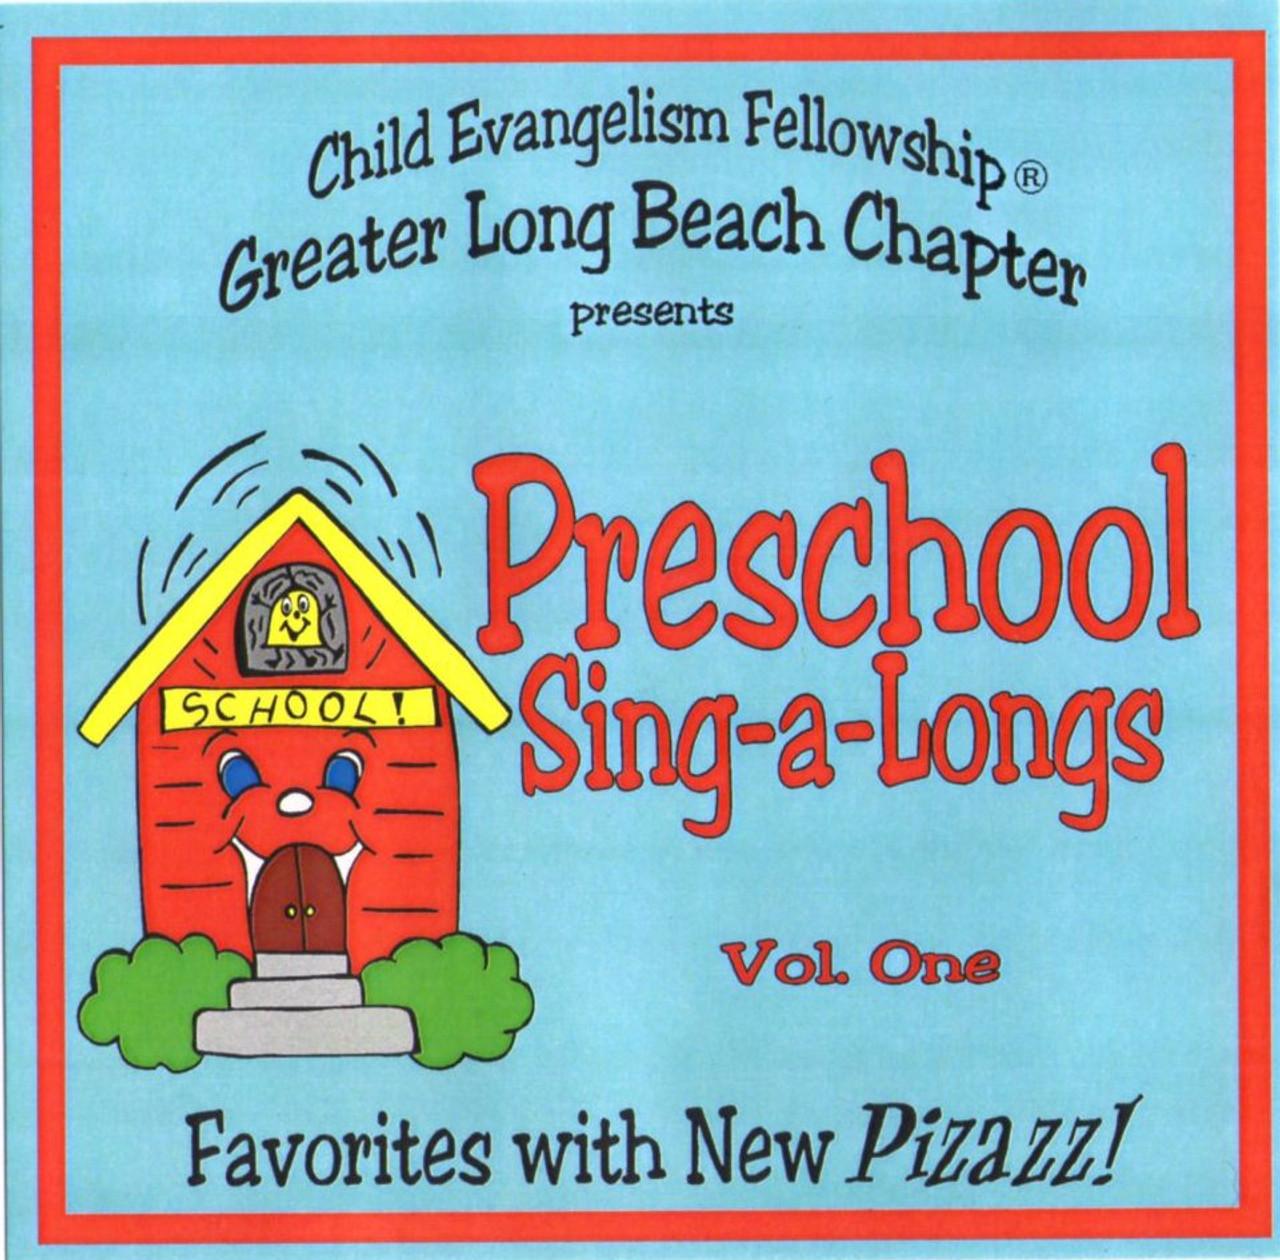 Preschool Sing-a-longs vol. 1 (music cd)